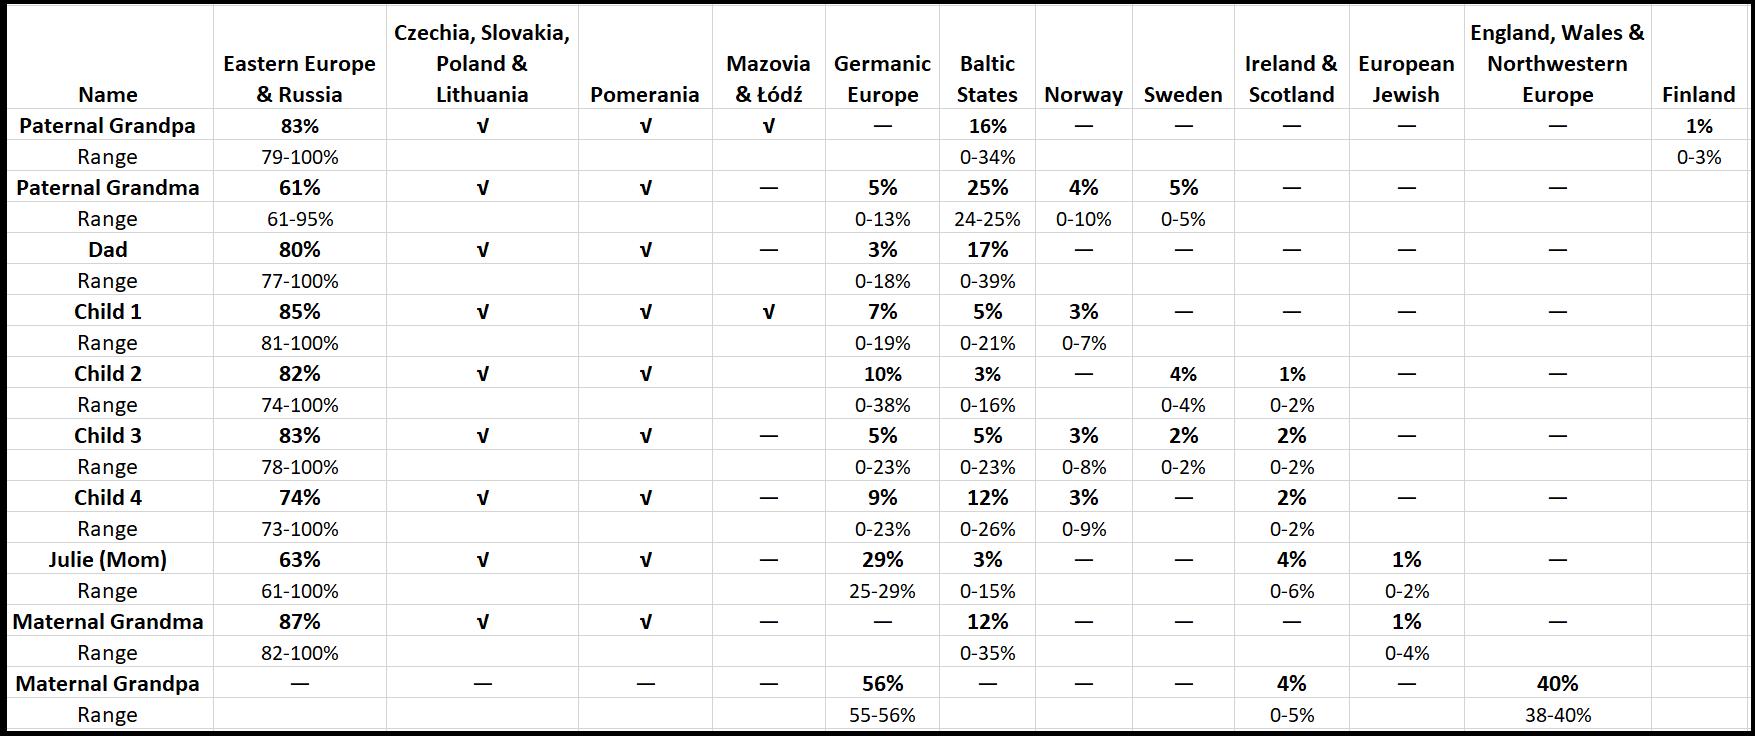 Family Ethnicity Estimates Chart for blog post